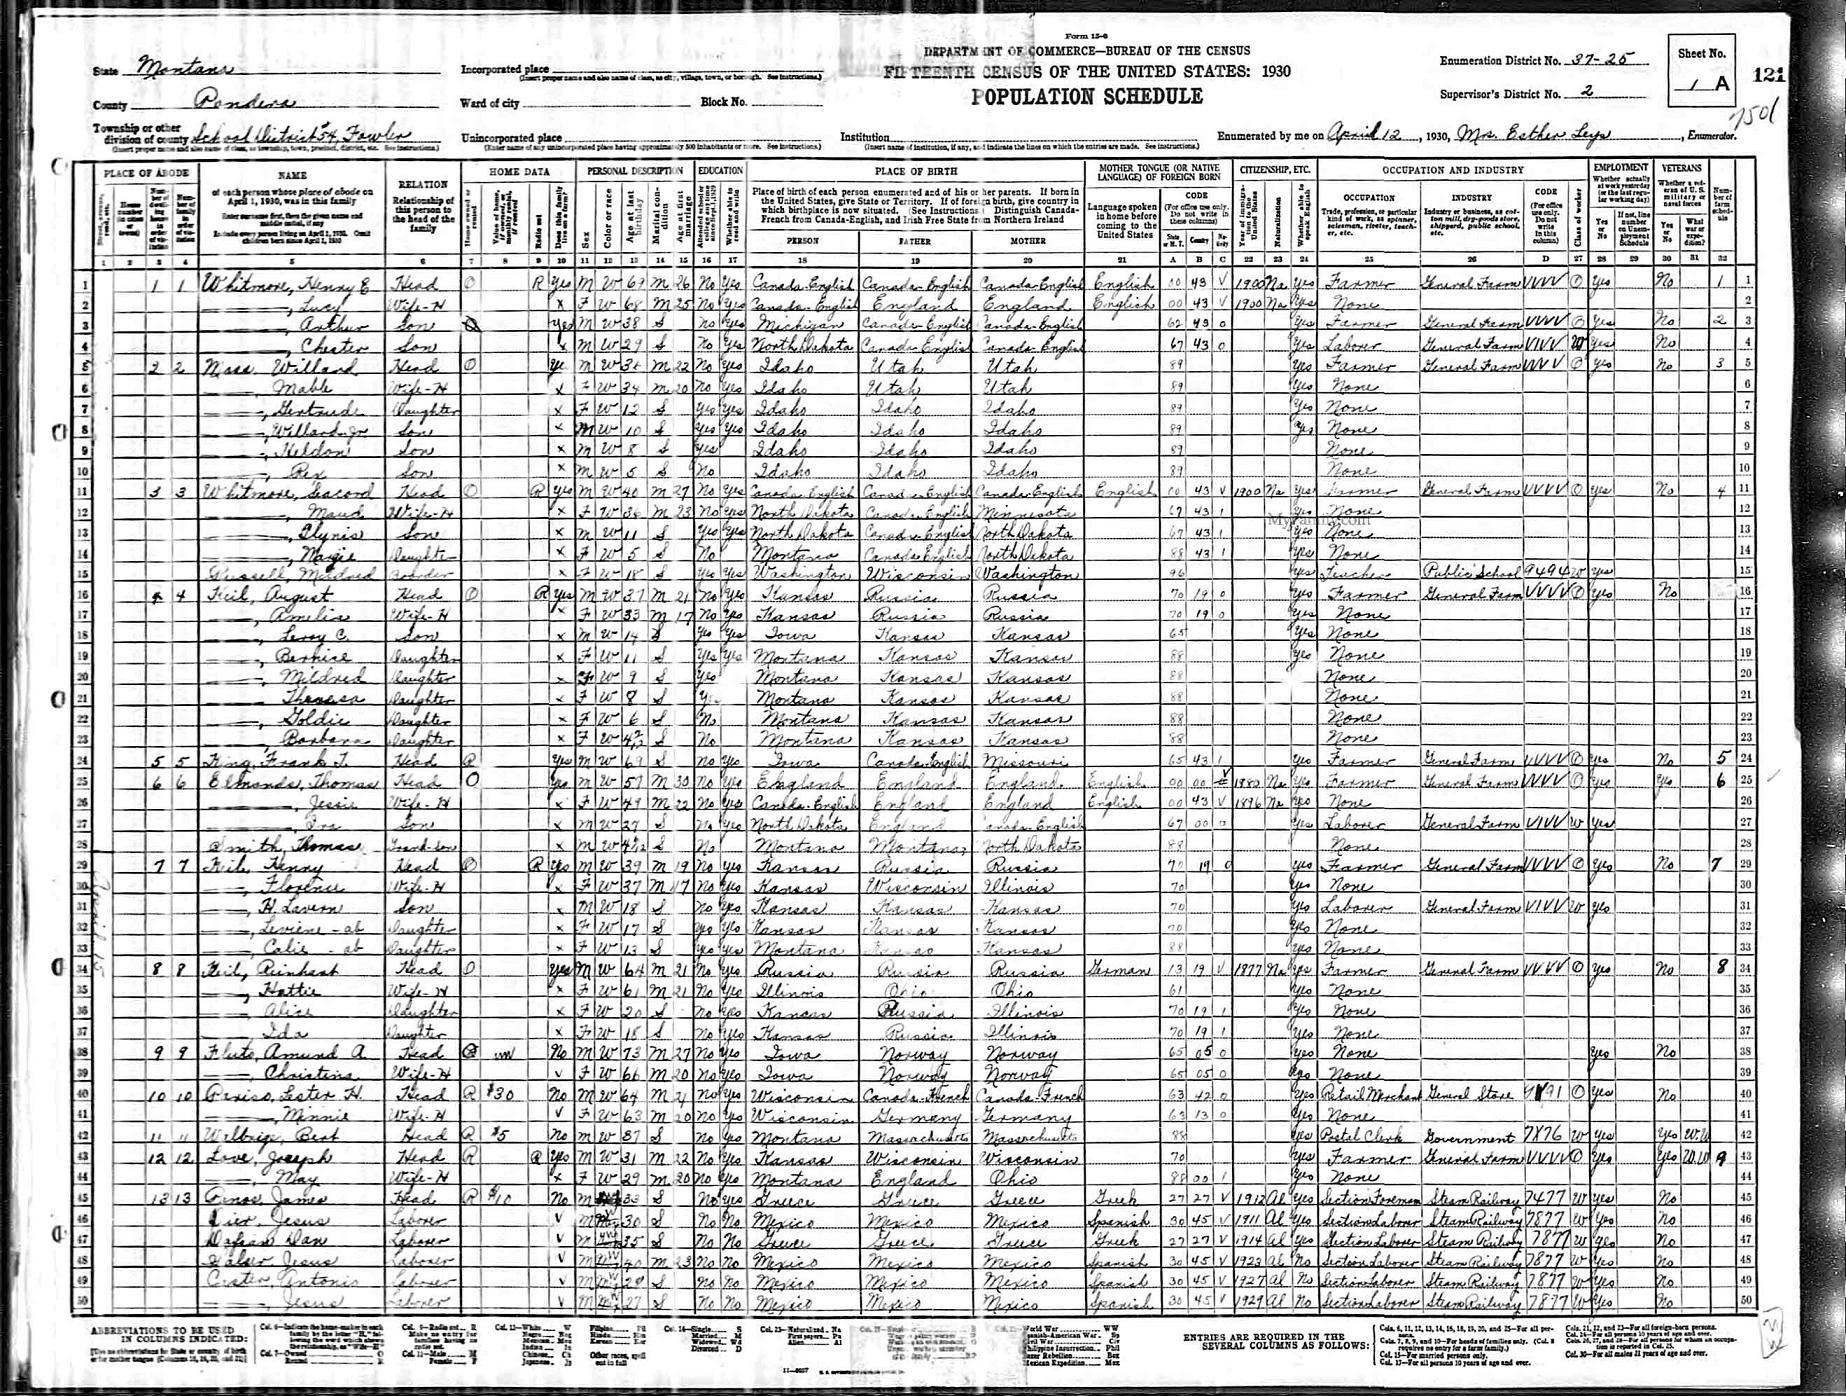 Montana pondera county ledger -  1930 Census Mildred Russell Fowler Pondera County Montana